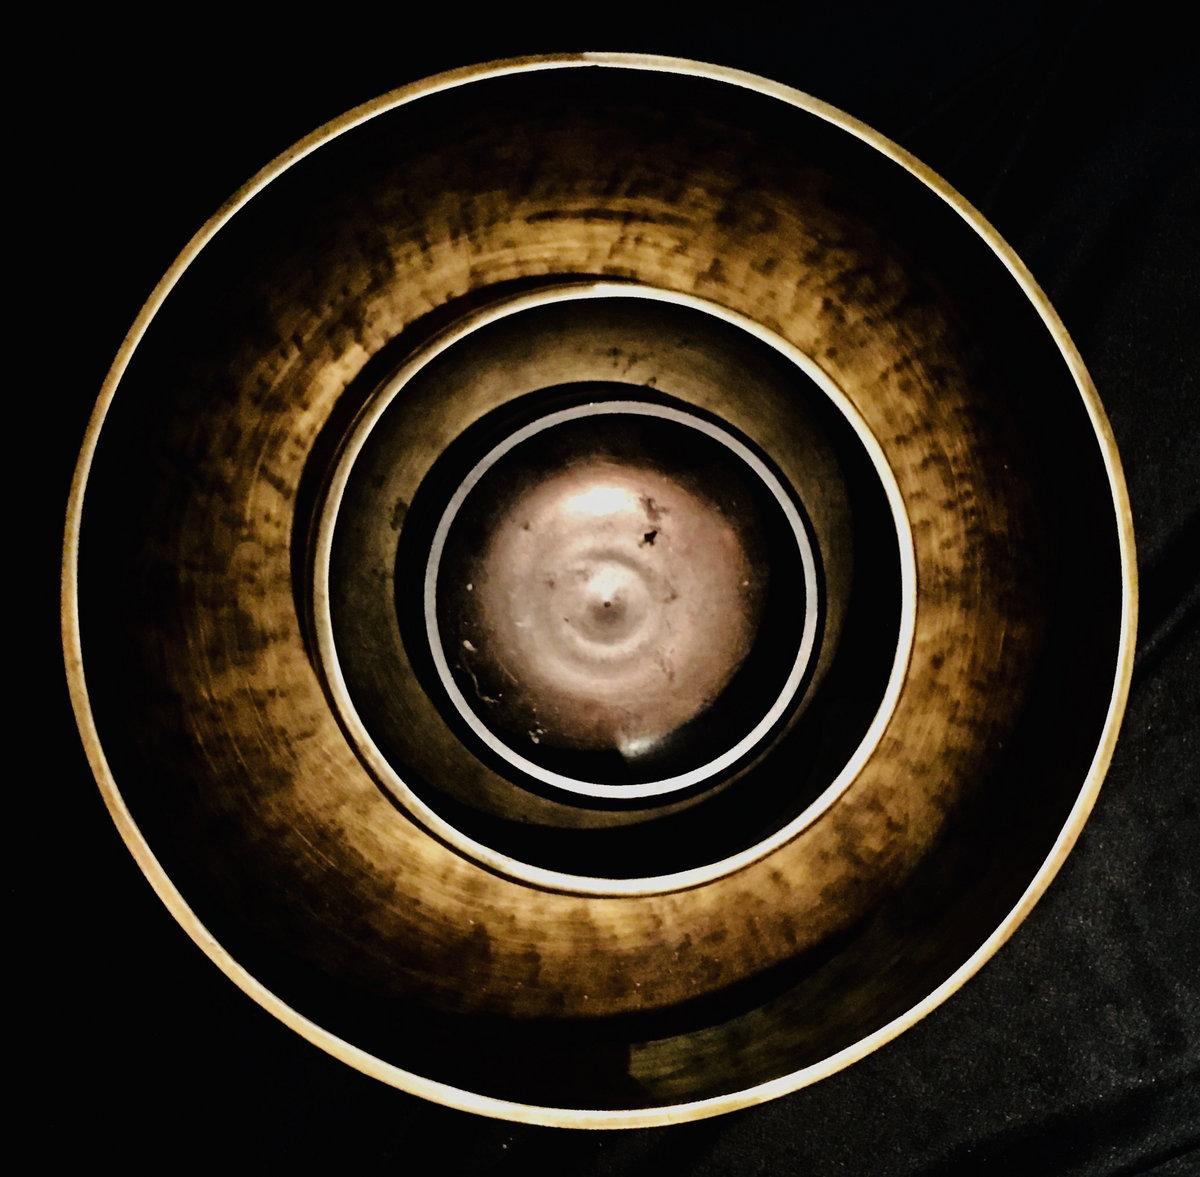 Serena Gabriel & Steve Roach — Tibetan Bowl Meditation